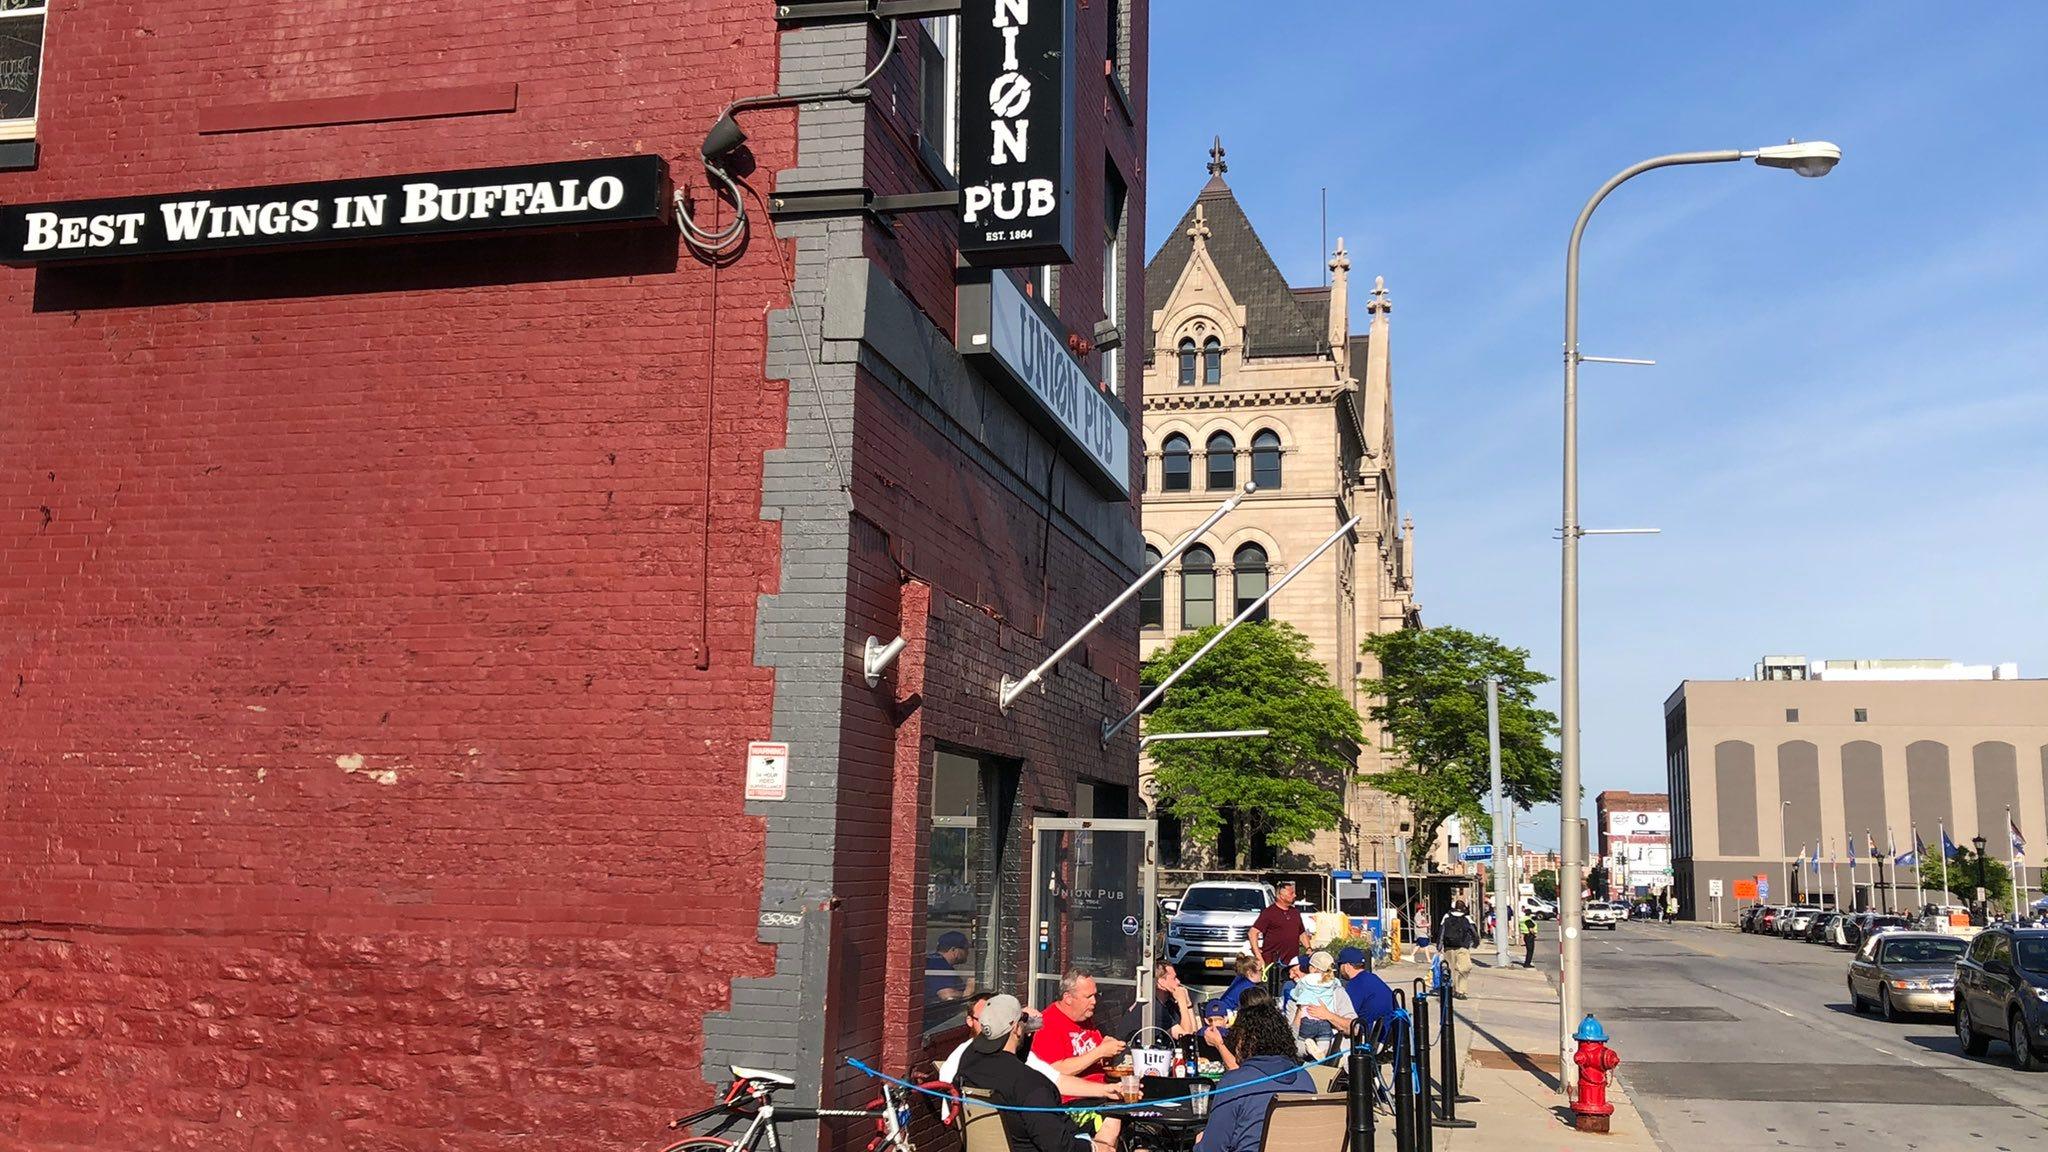 Blue Jays represent home run for downtown restaurants